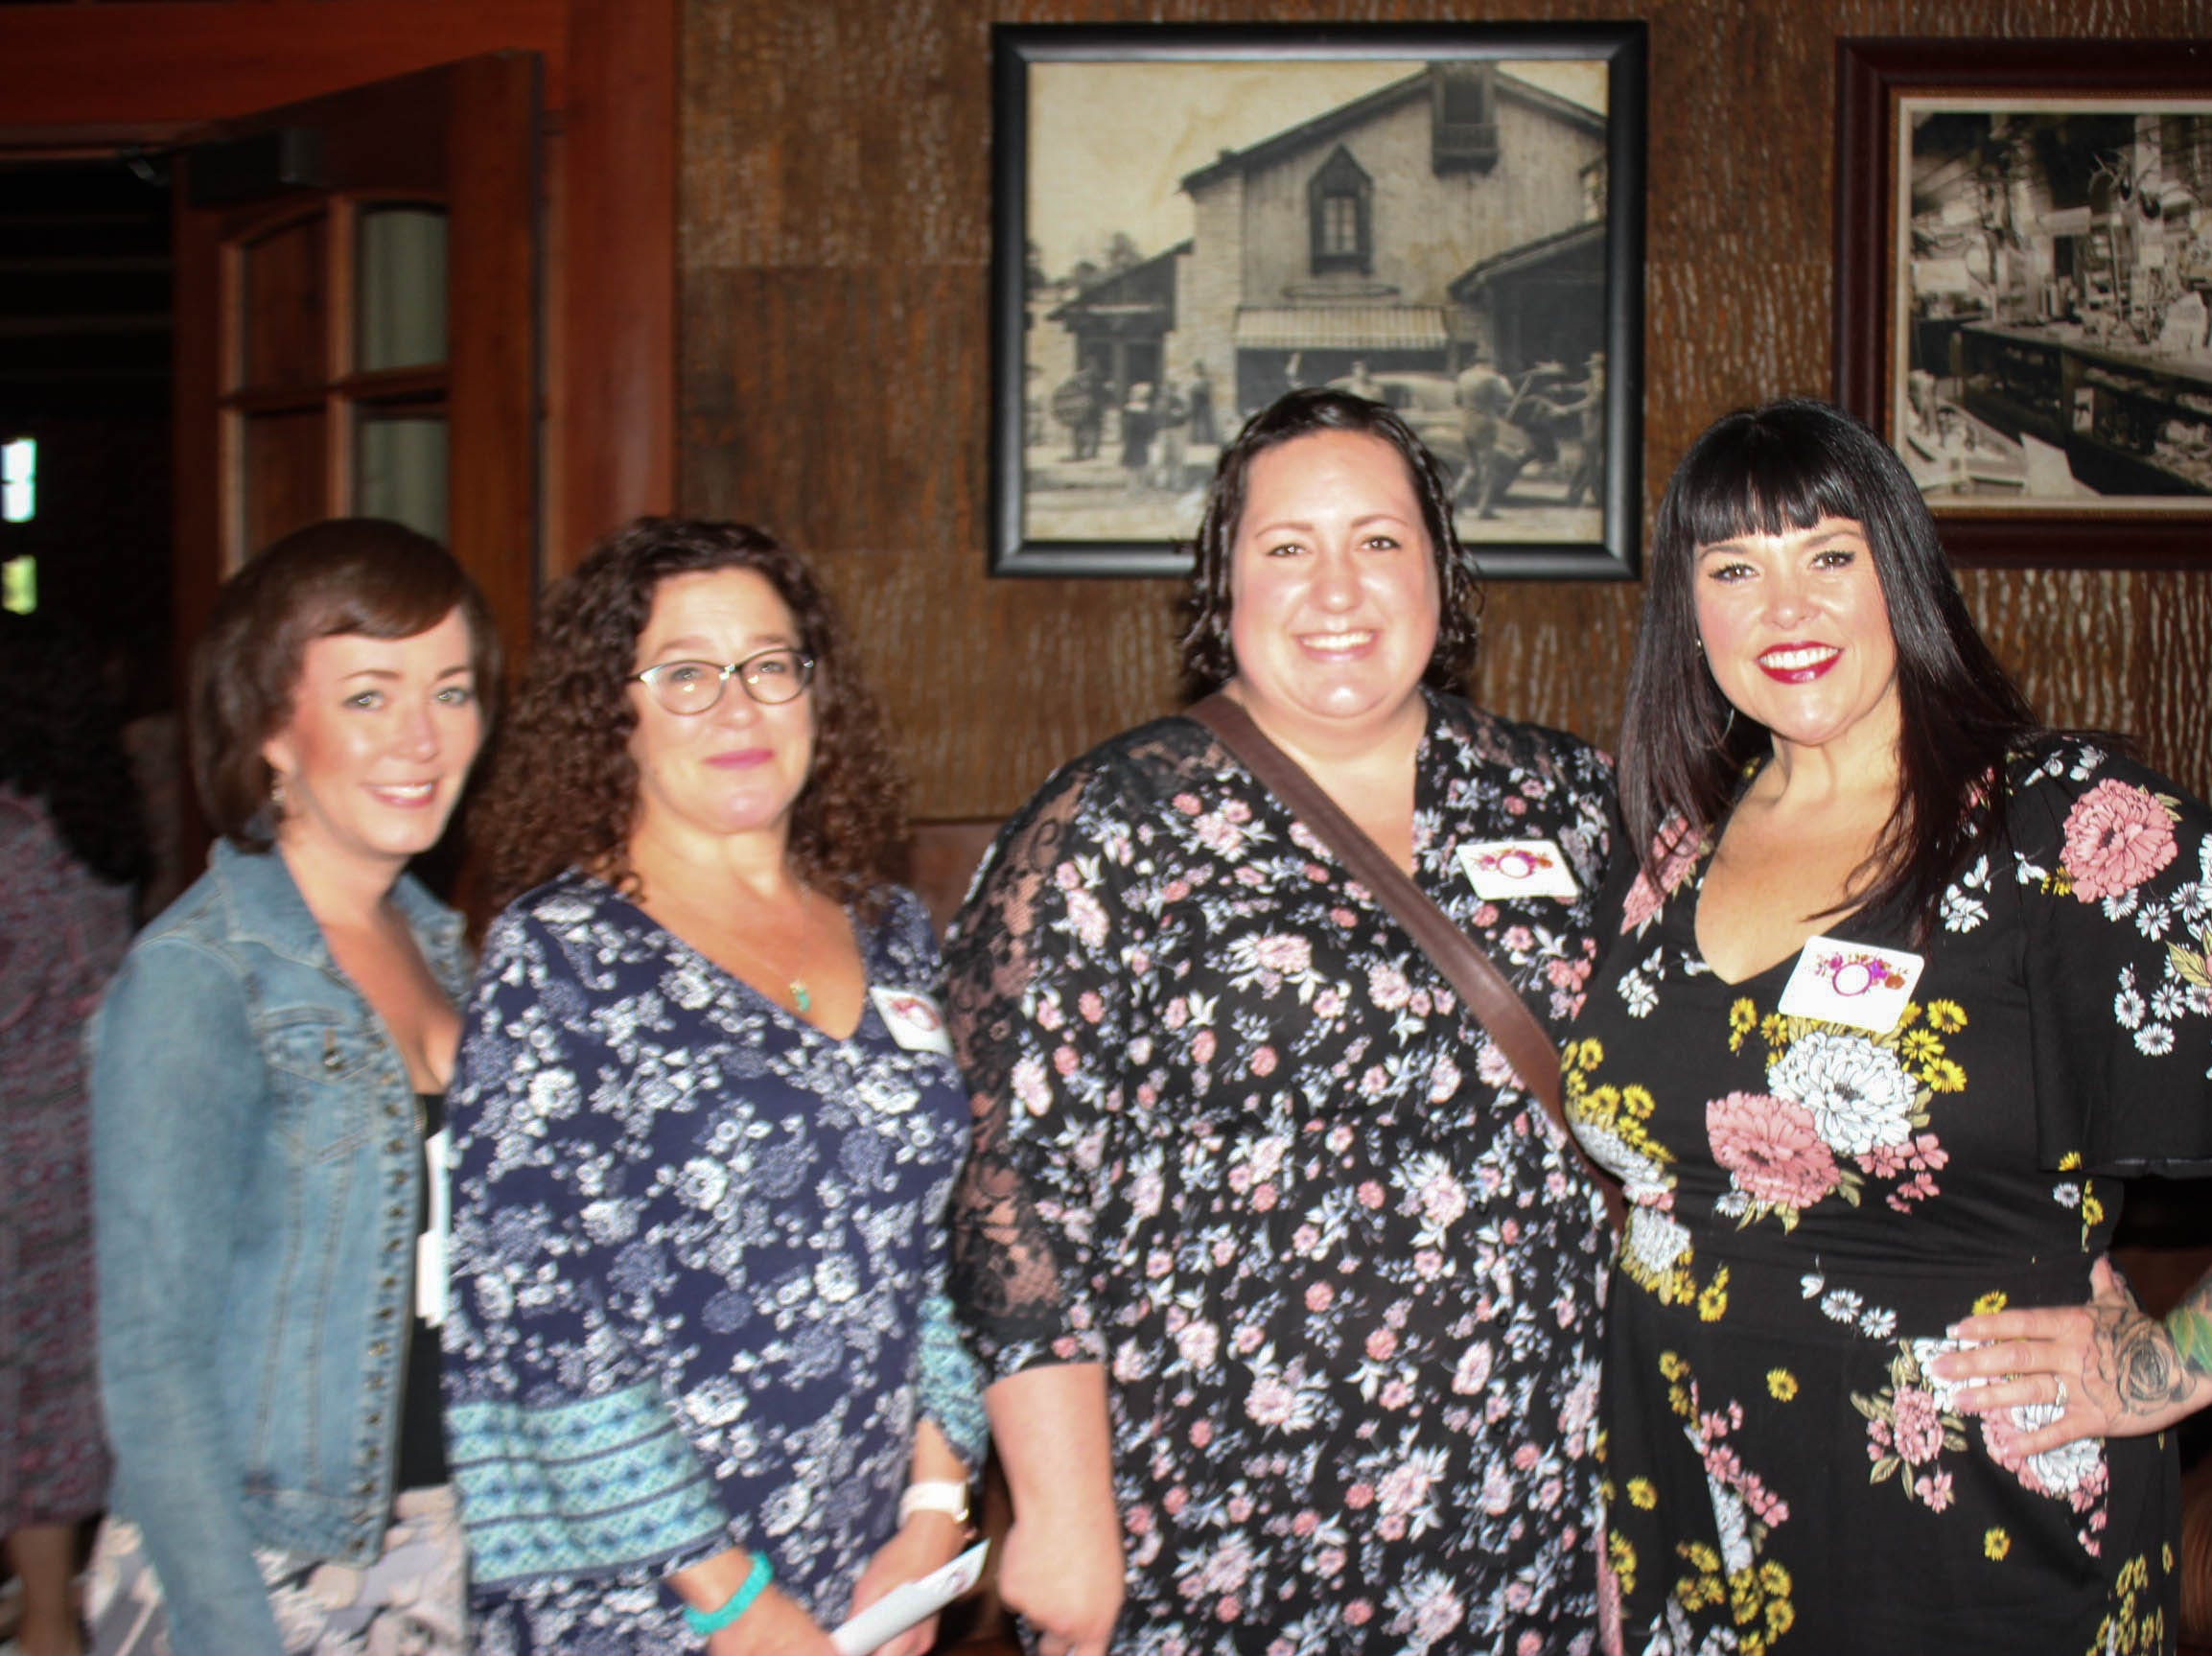 Dawn Clatchbaugh, Lisa Hamaker, Nicole Hagen, and Lou Rios